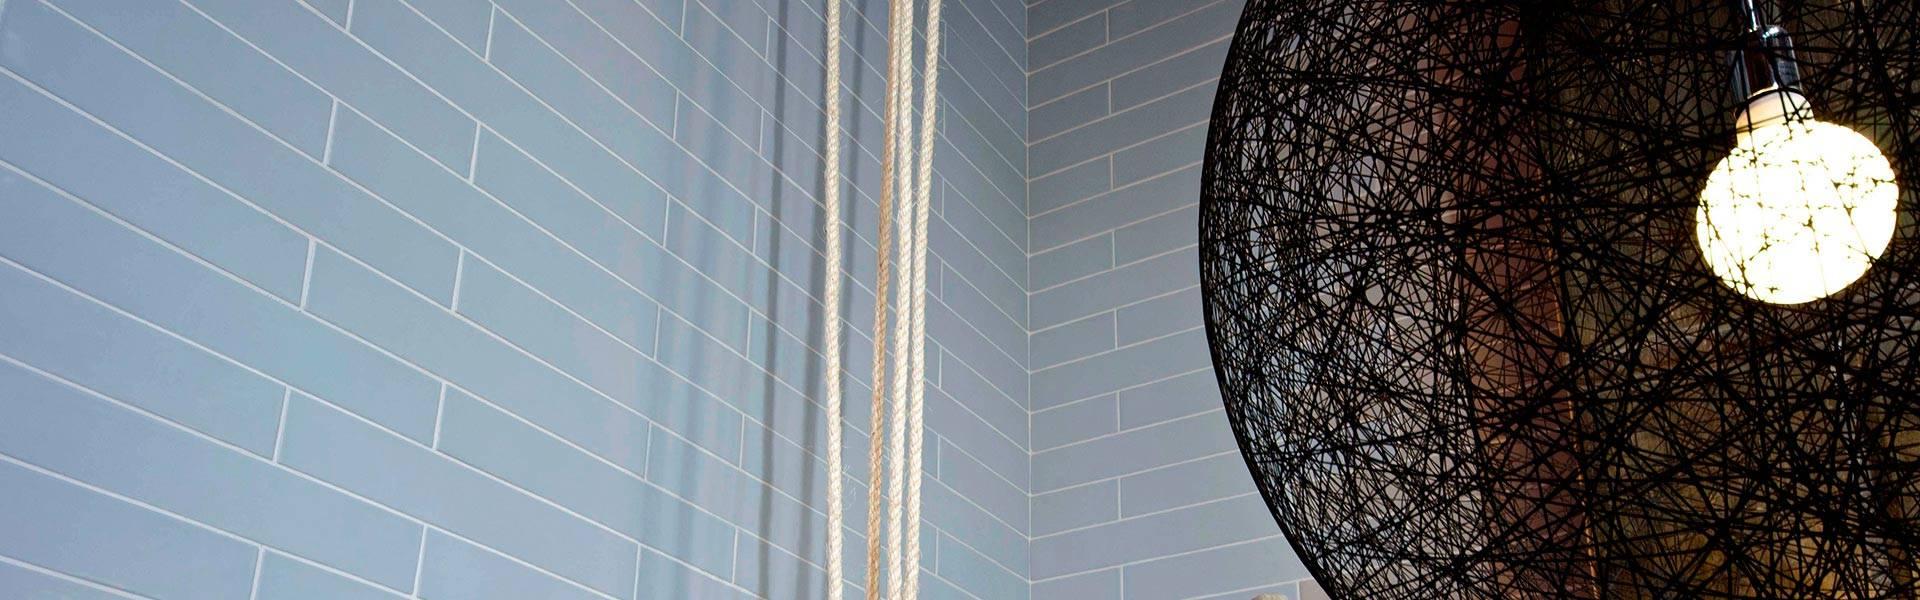 Mixed Matt Subway Tiles Dublin 6.5x40x1.05cm Bolero